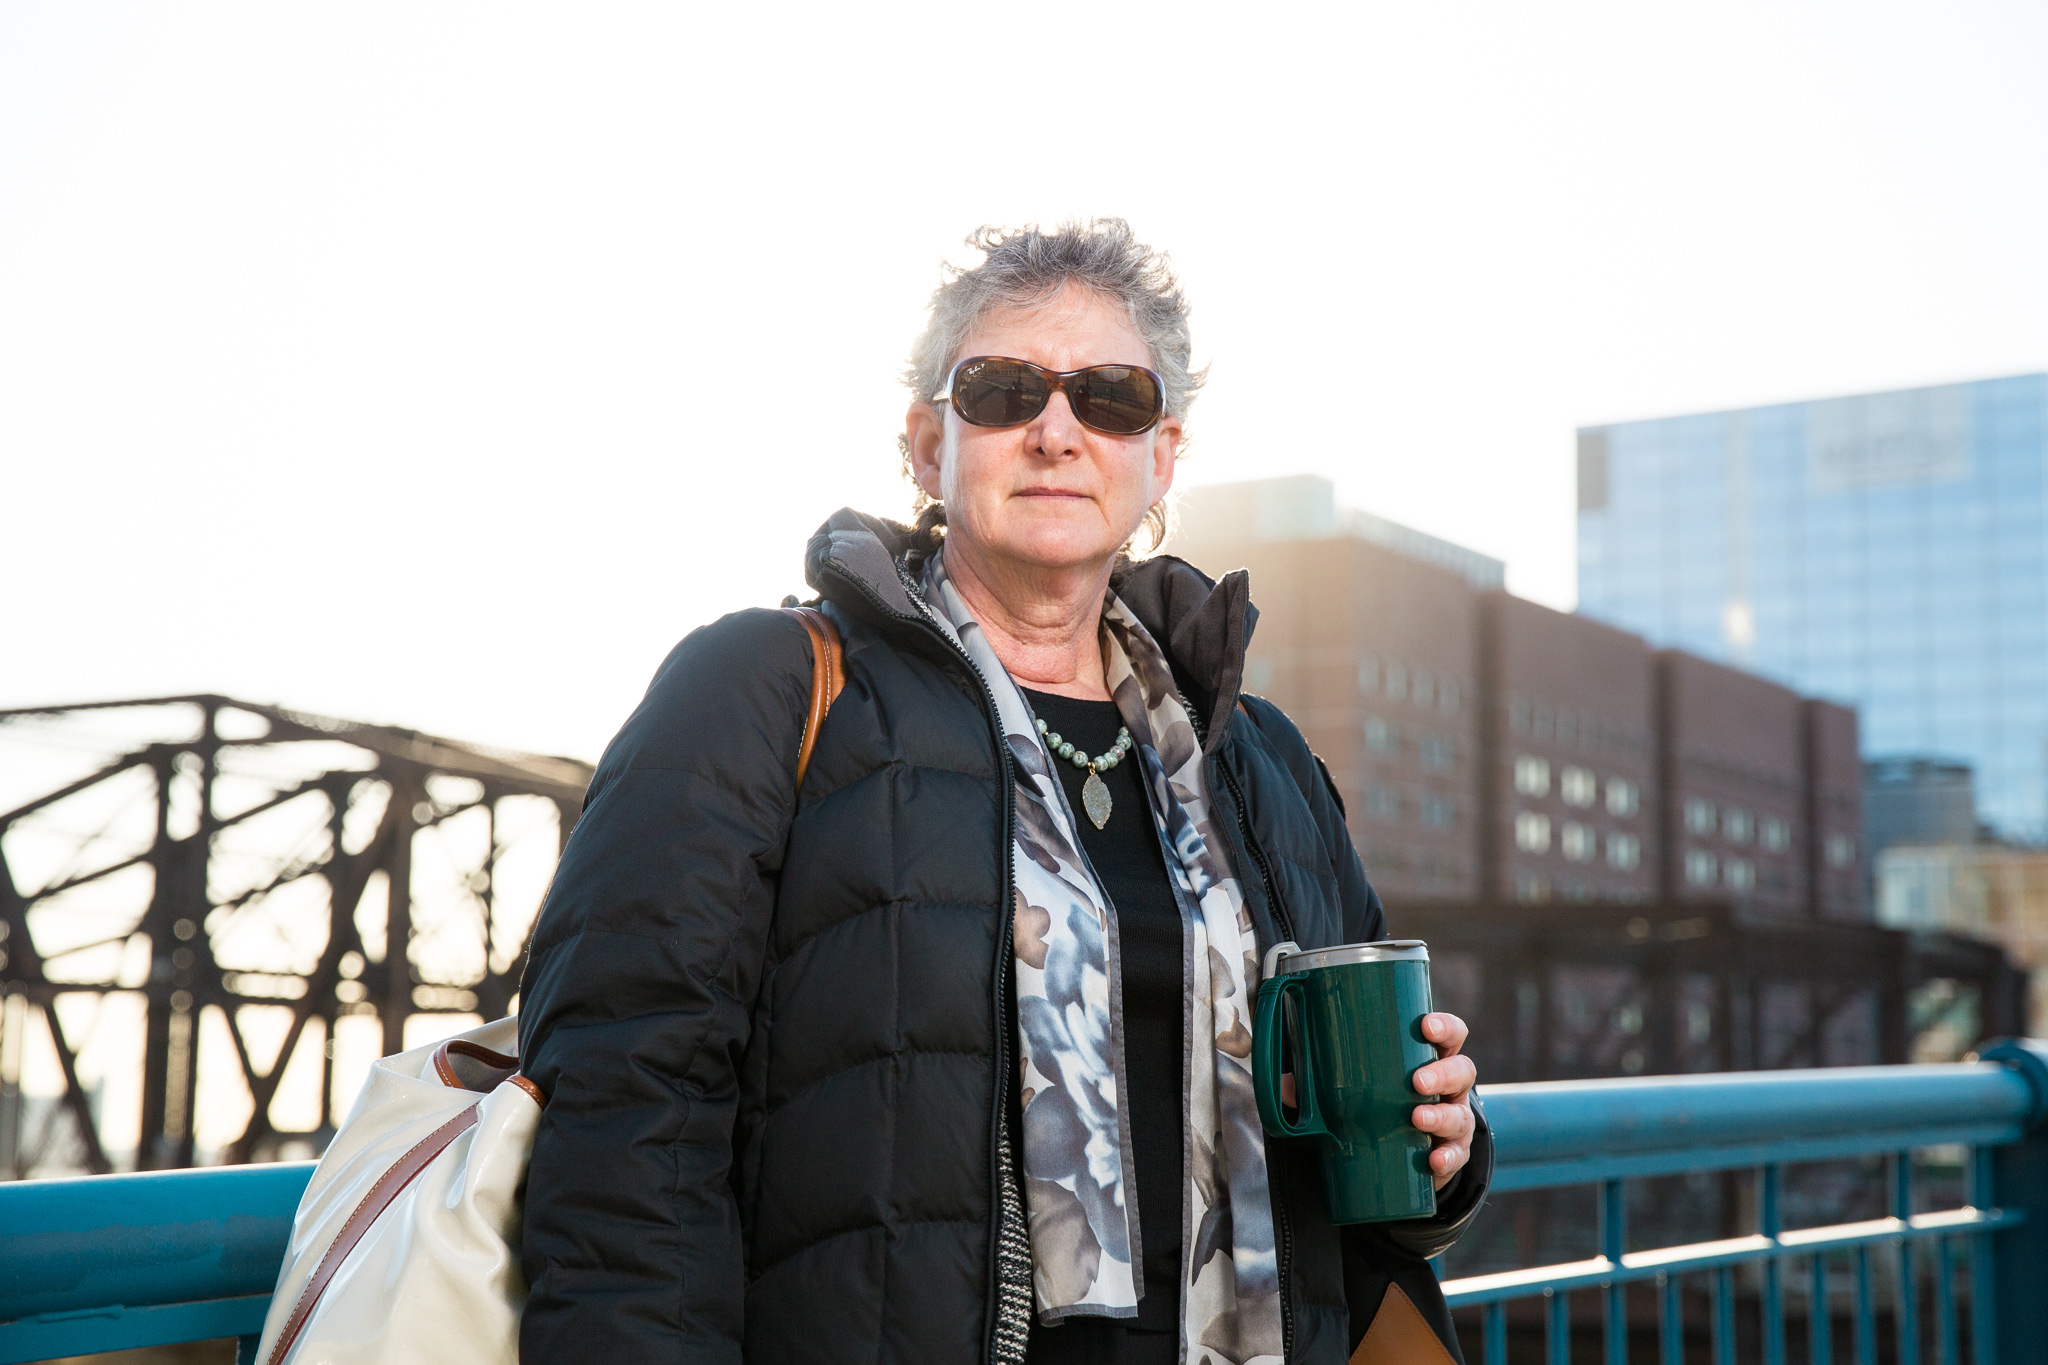 woman-on-bridge-with-coffee.jpg